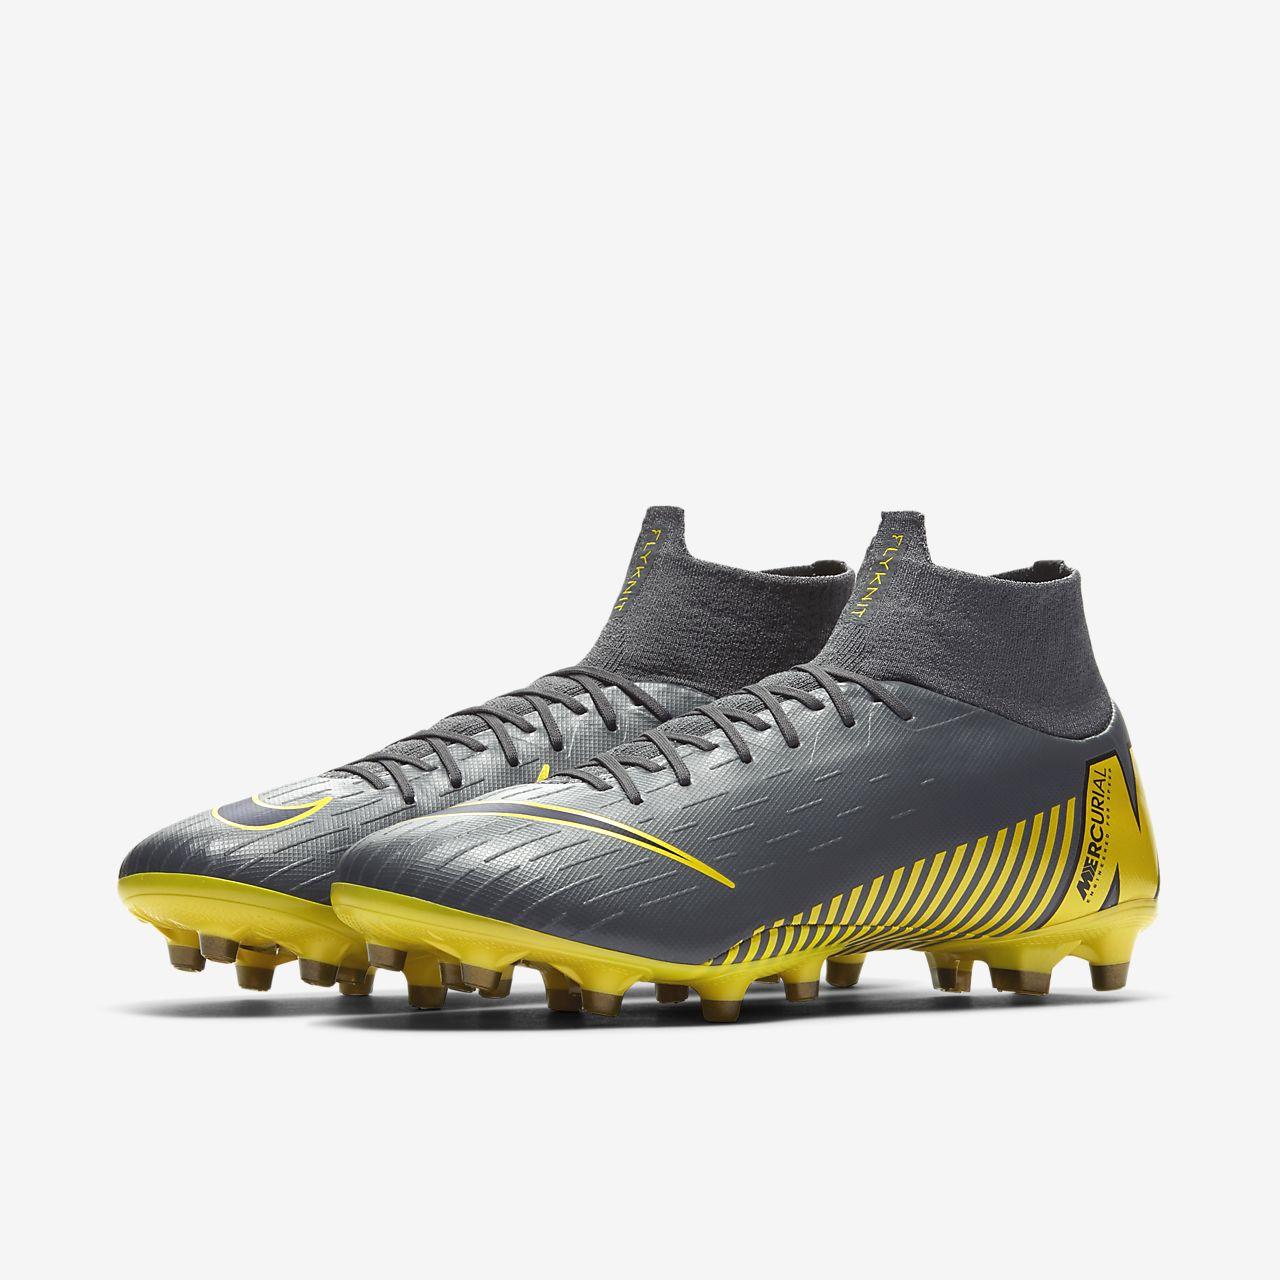 detailed look 6f1d2 b780c ... Chaussure de football à crampons pour terrain synthétique Nike  Mercurial Superfly VI Pro AG-PRO